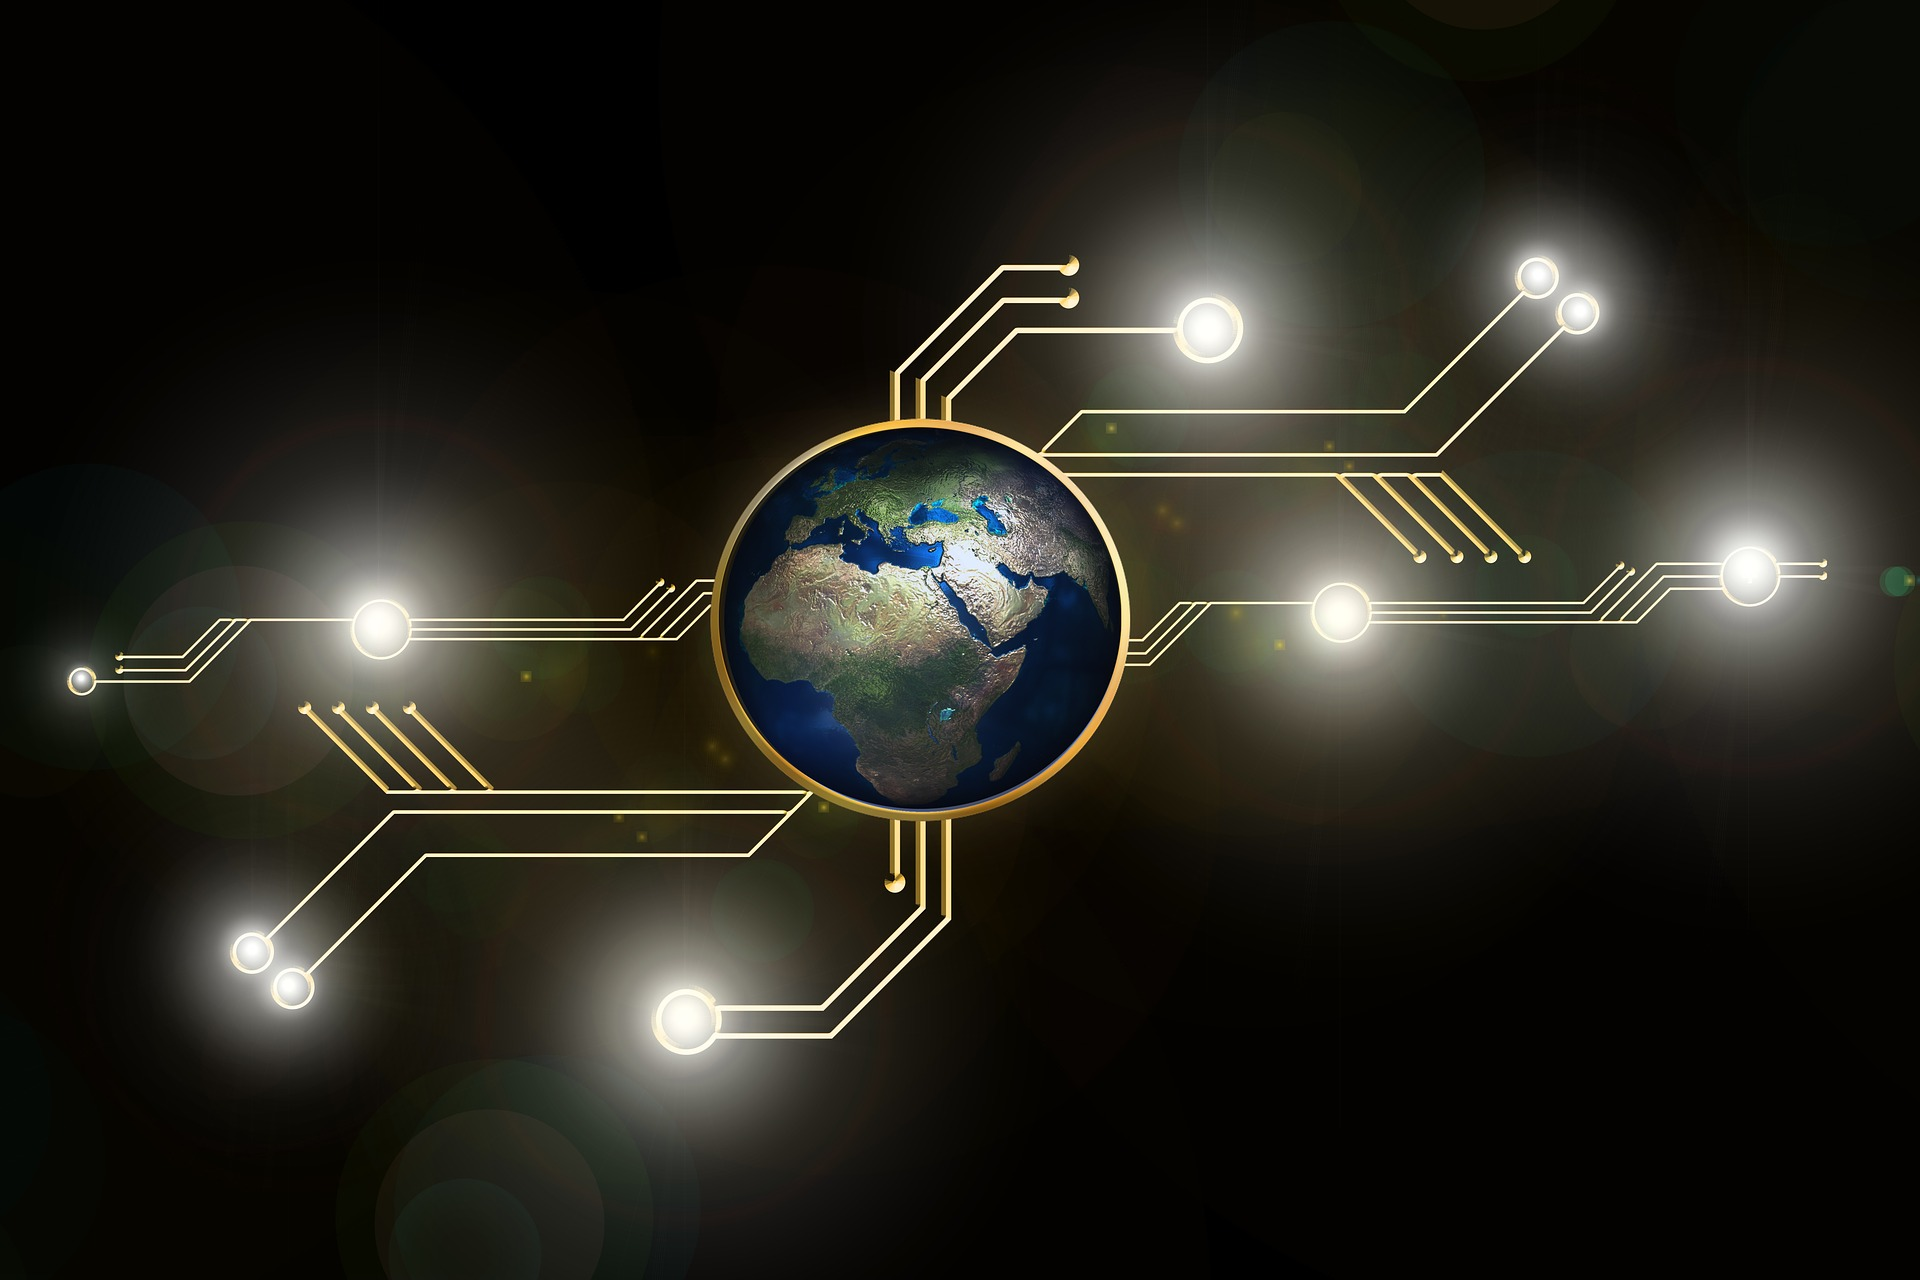 Stablecoin EuPi on the basis of ERC-20 blockchain